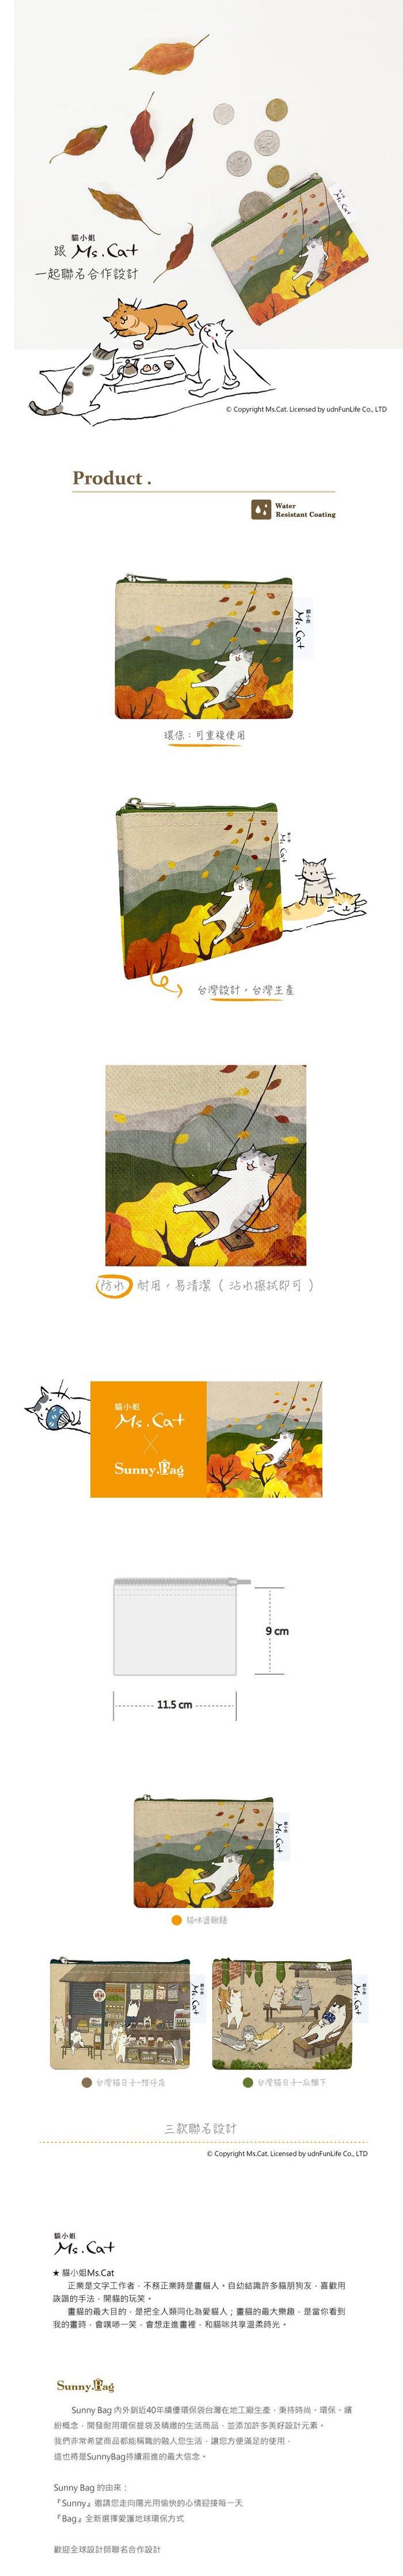 Sunny Bag x 貓小姐Ms.Cat-零錢包_貓咪盪鞦韆